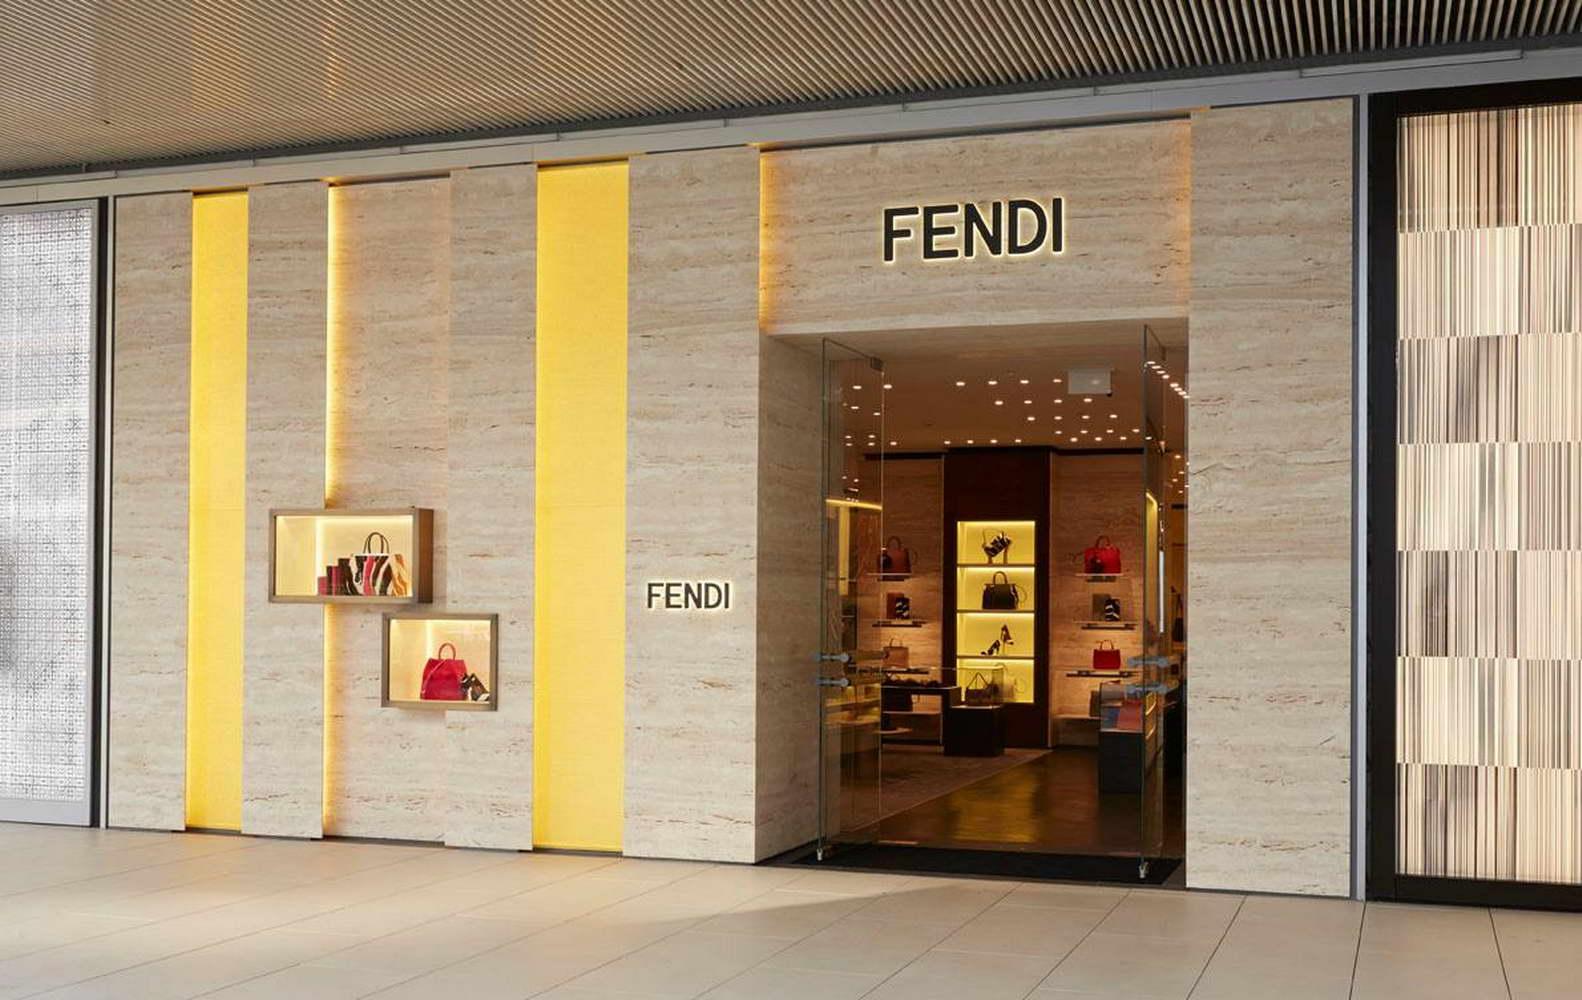 Fendi Boutique Istanbul Turkey Floors Wall Cladding Shelves